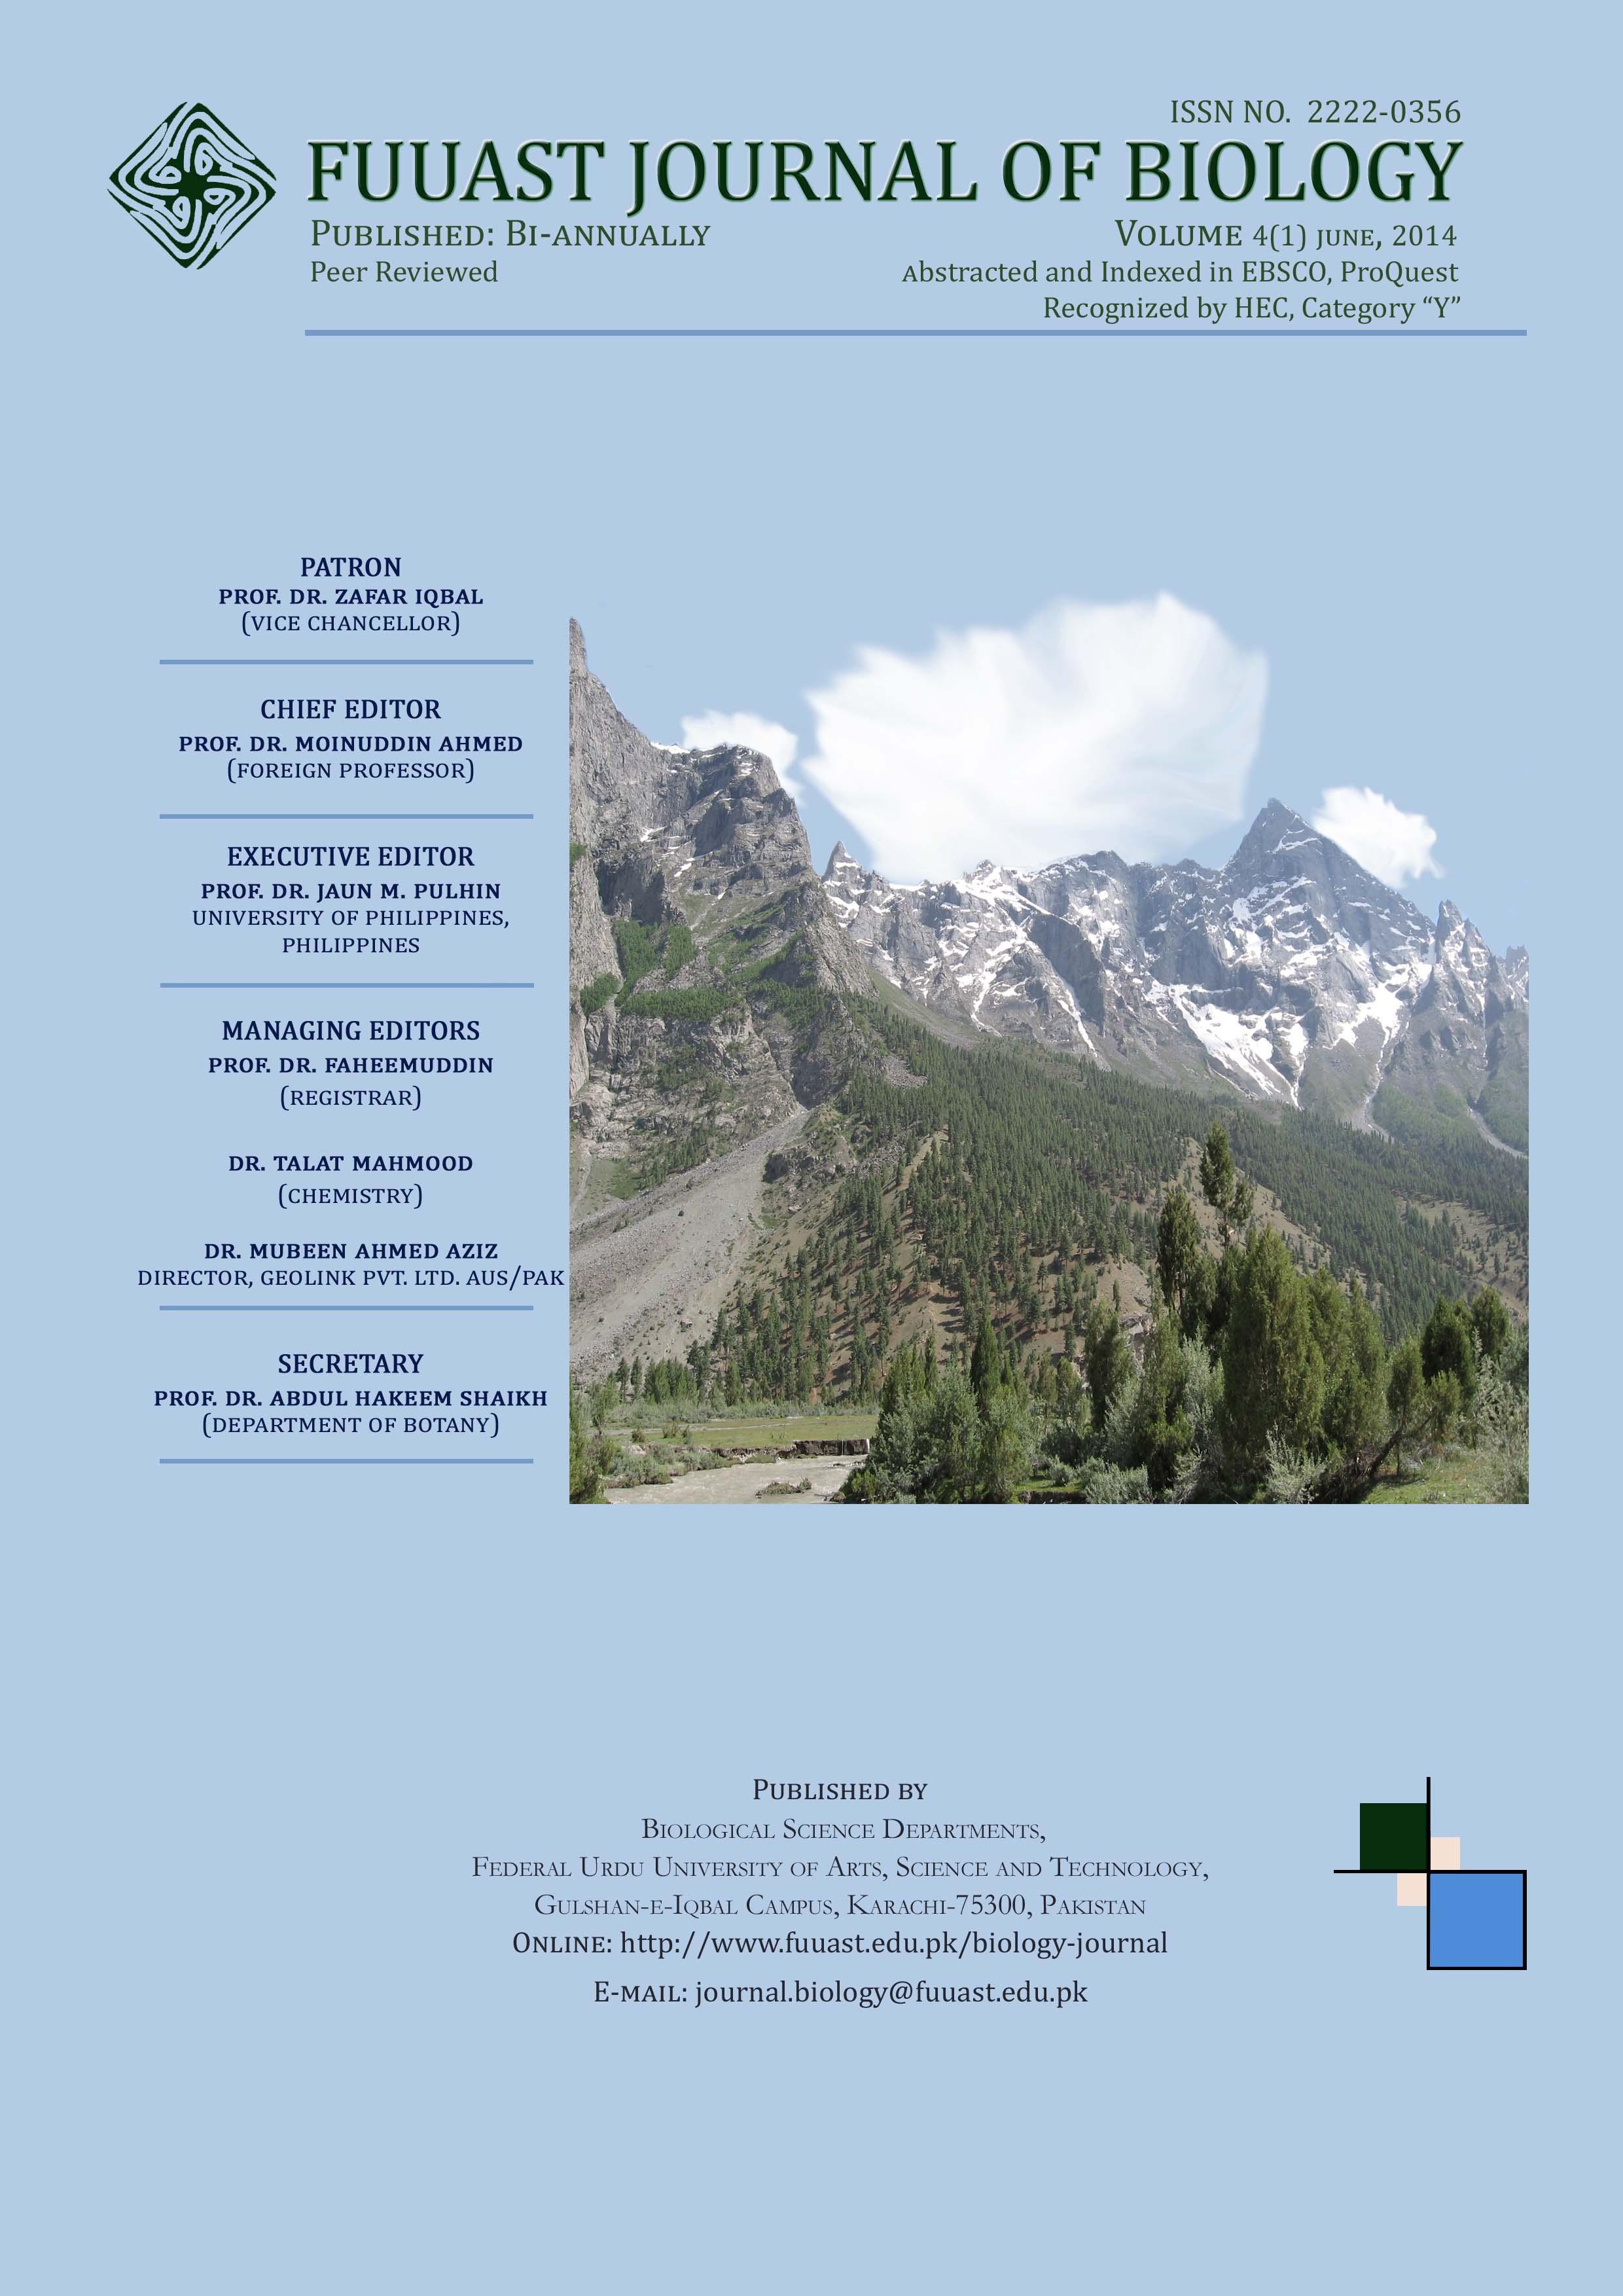 View Vol. 4 No. 1 (2014): Volume 4 (1) June, 2014